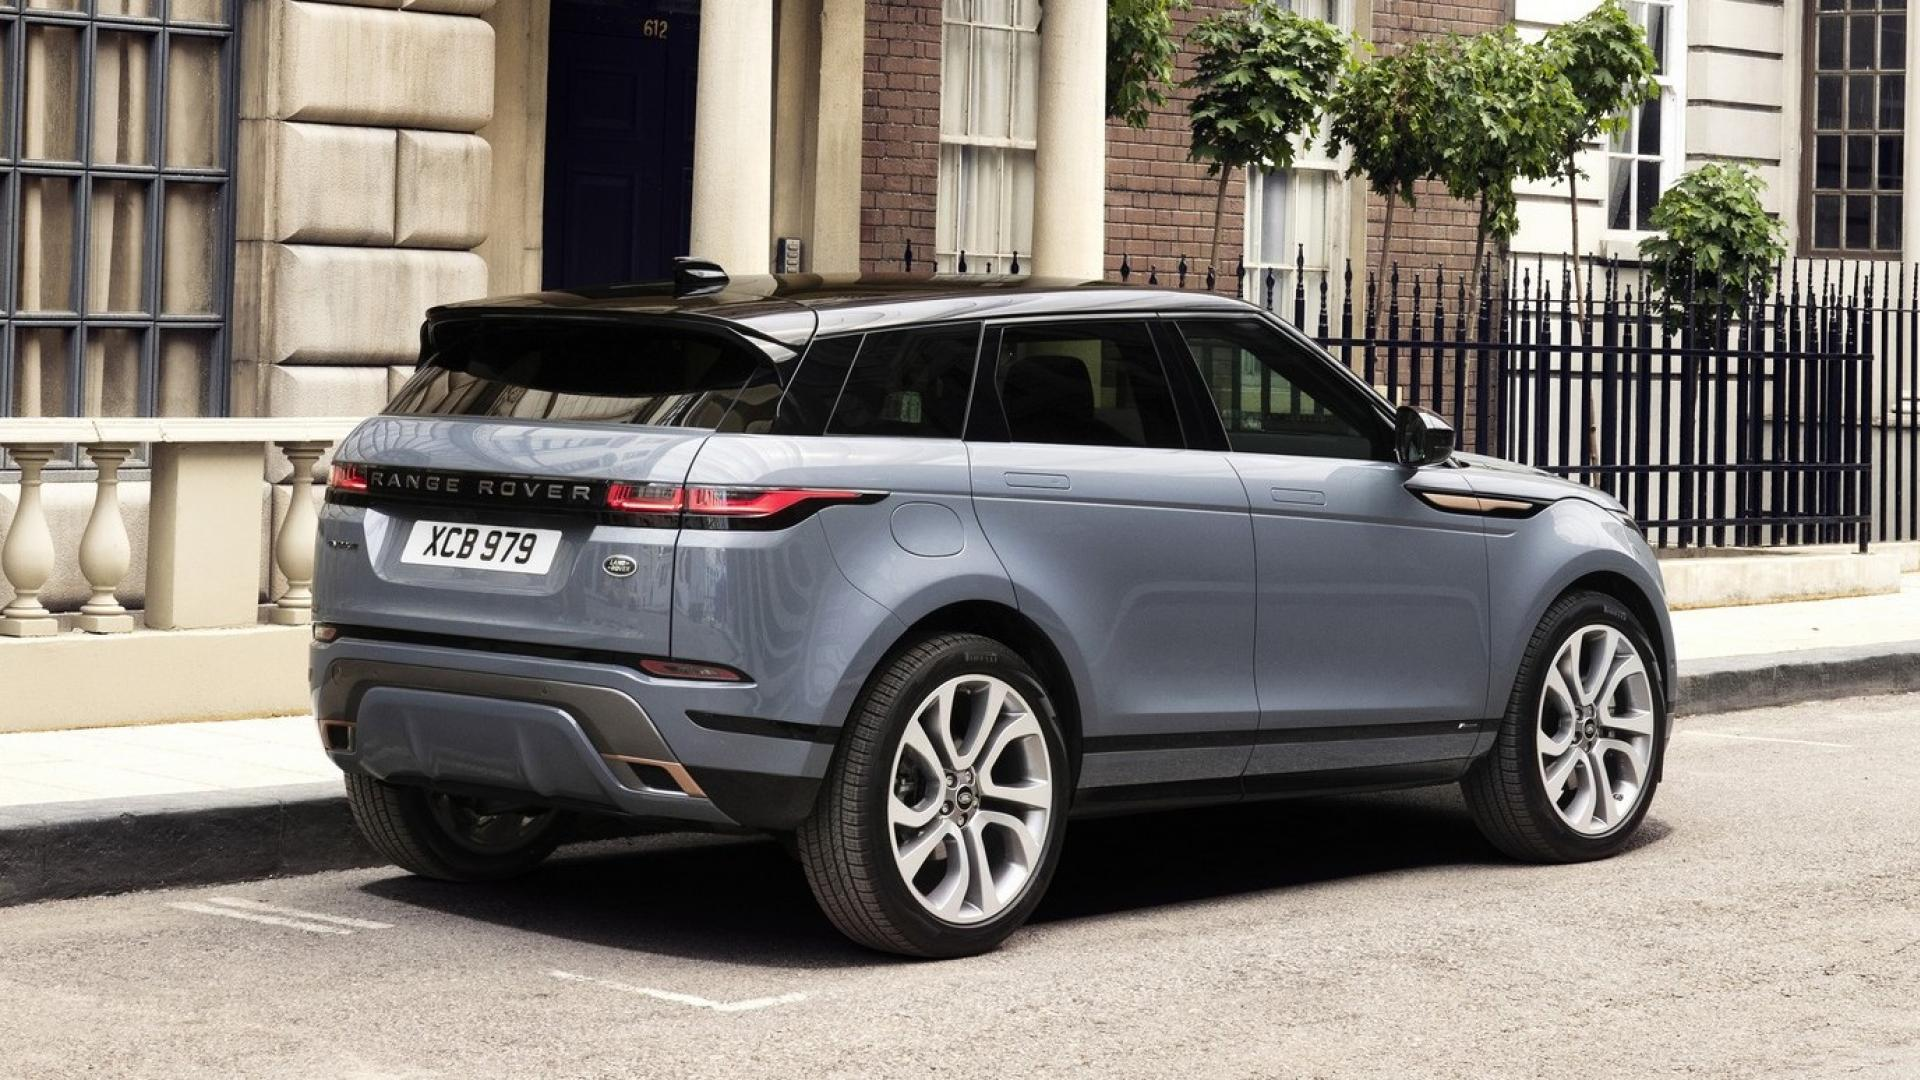 Hertz, entra il flotta la Range Rover Evoque Mild Hybrid thumbnail